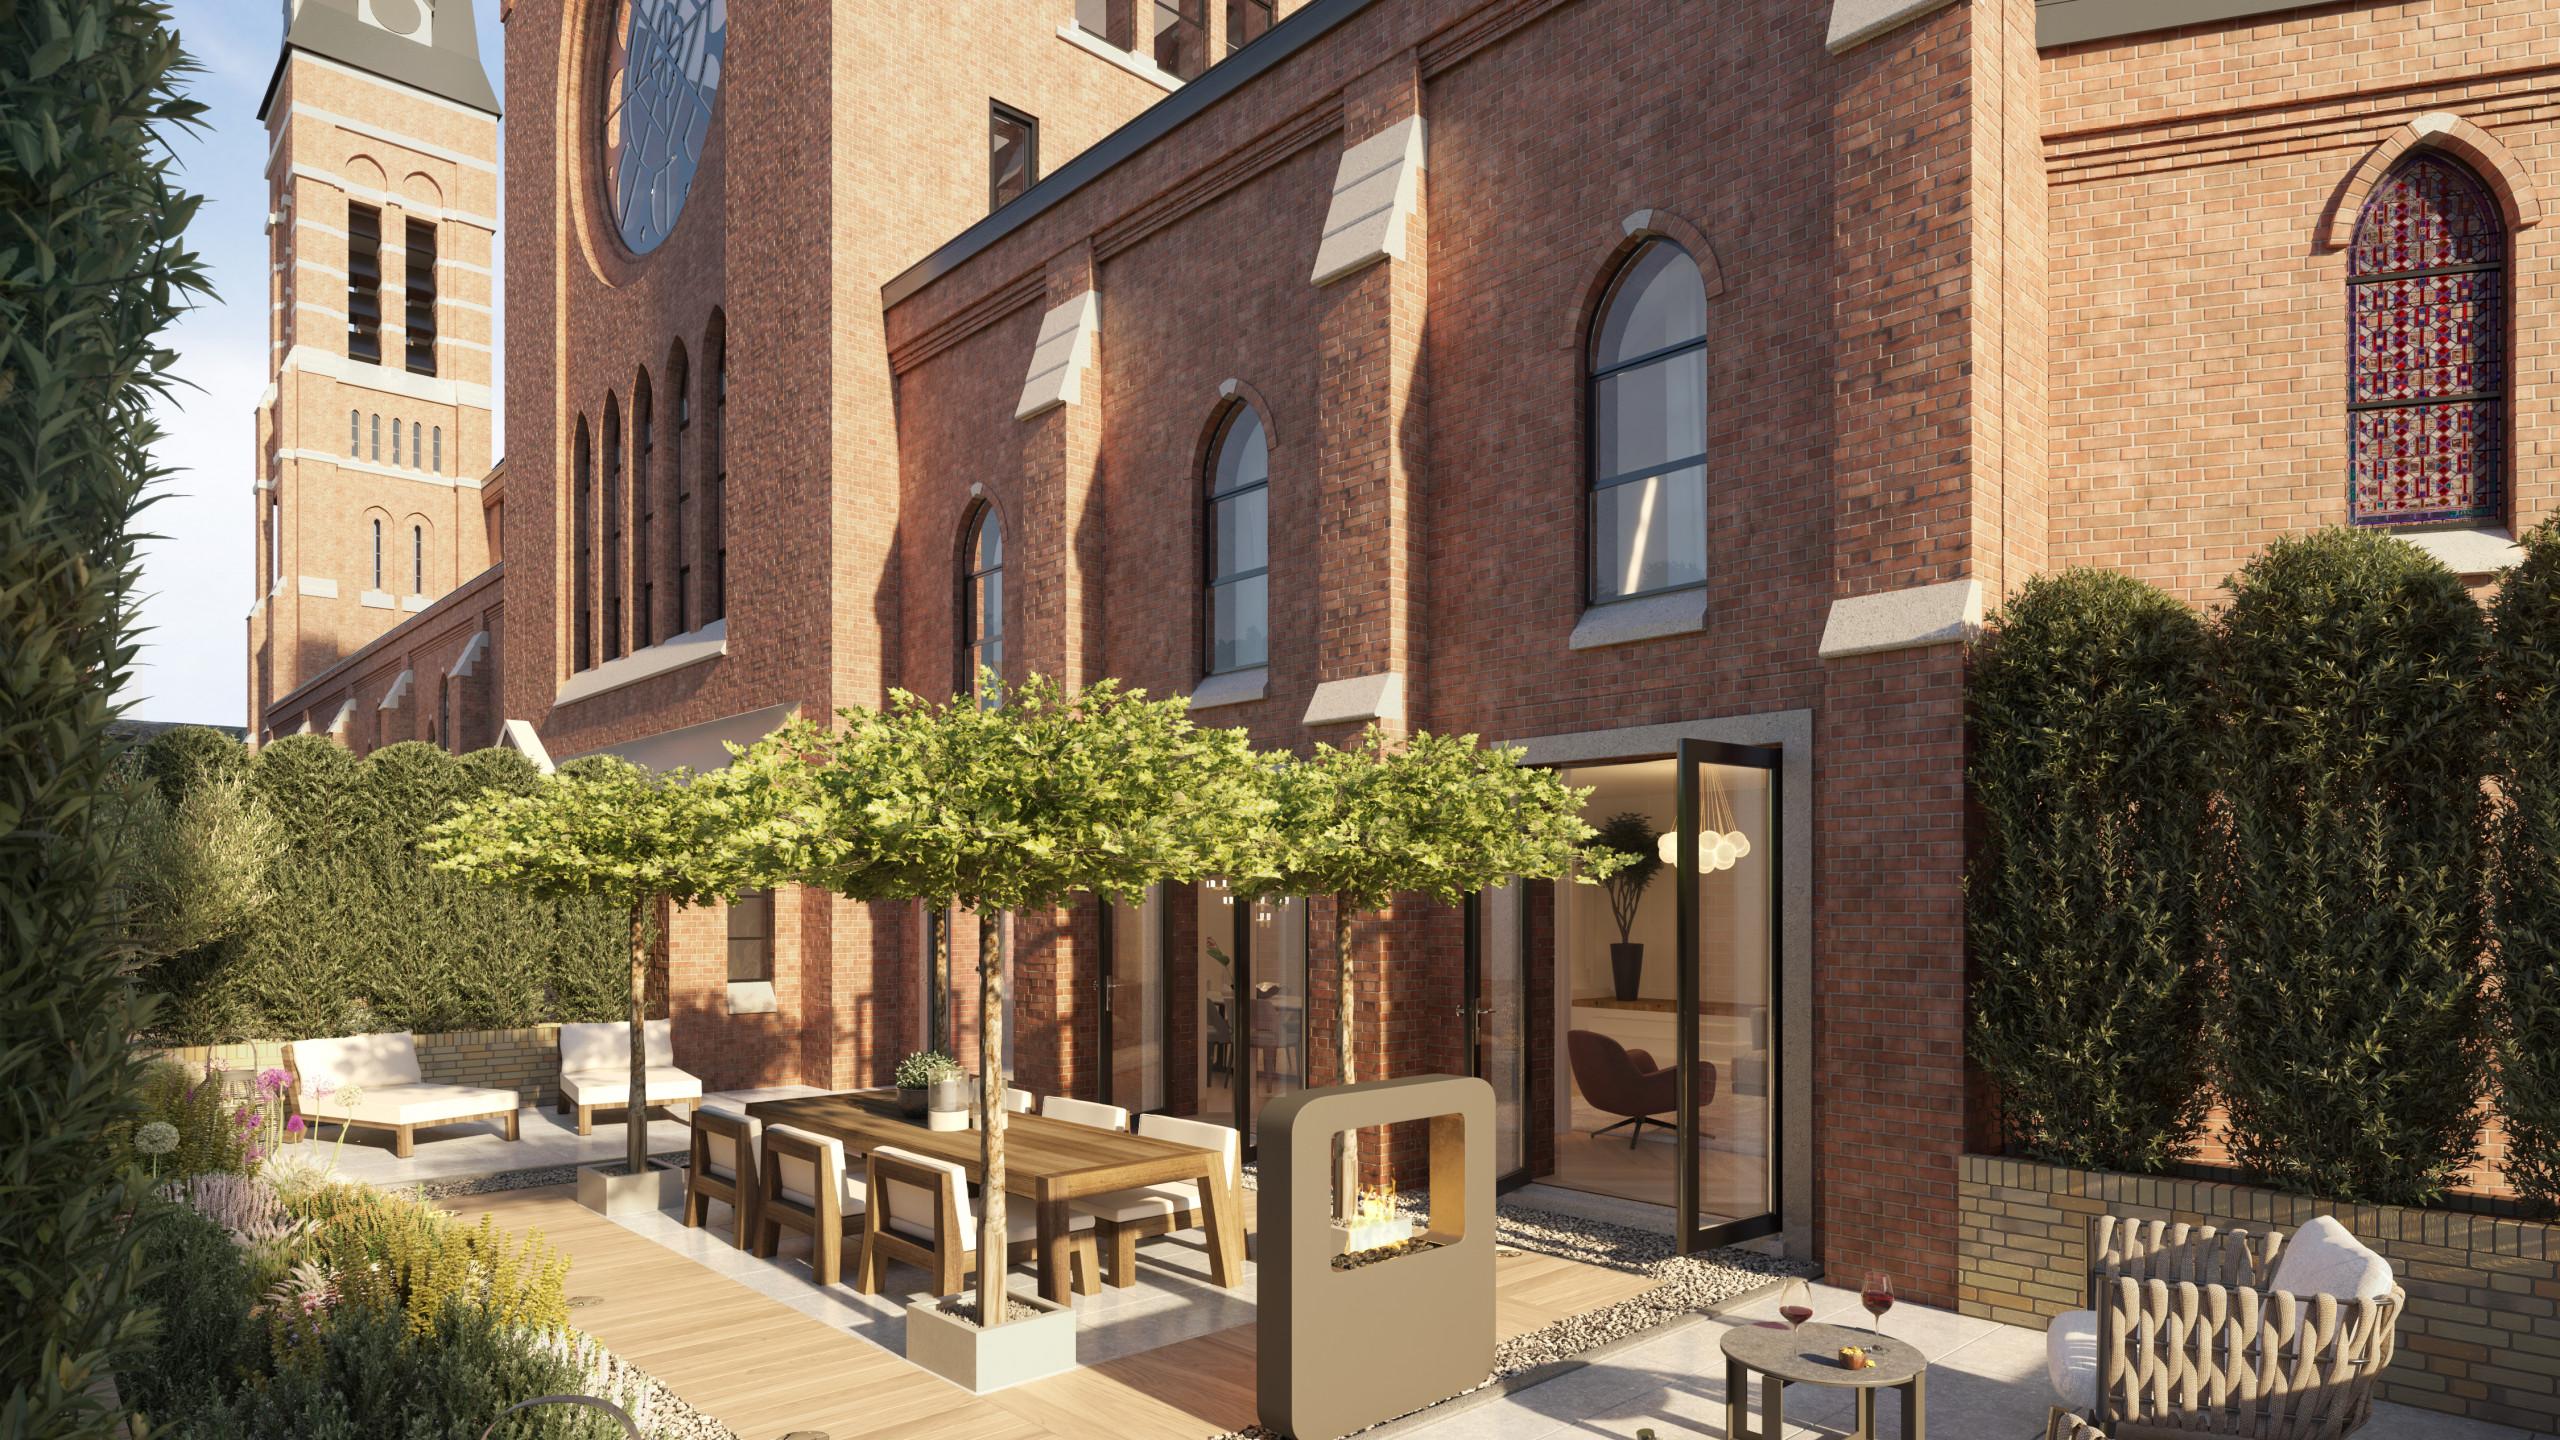 Beeldenfabriek - Hemels Wonen te Breda 2